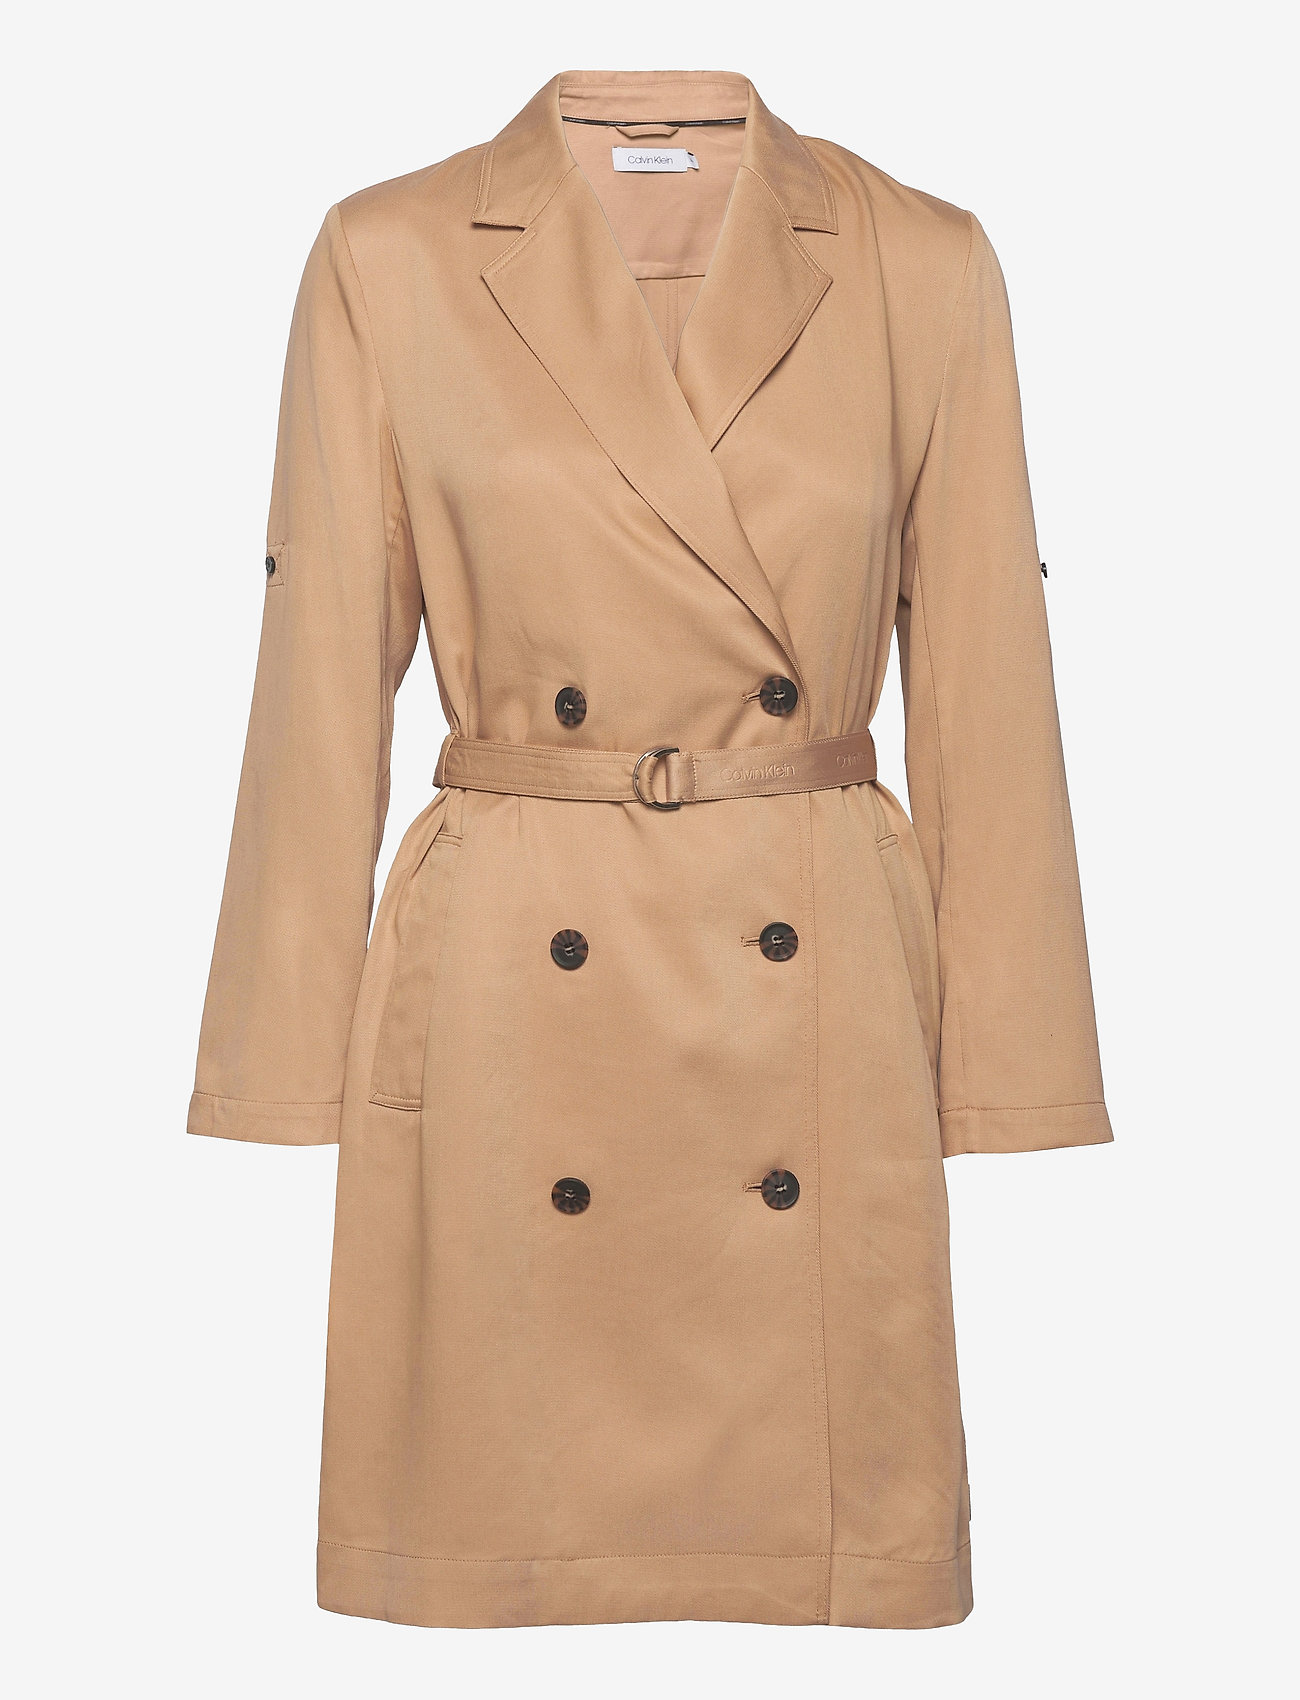 Calvin Klein - TENCEL TRENCH DRESS - trenchcoats - travertine - 0